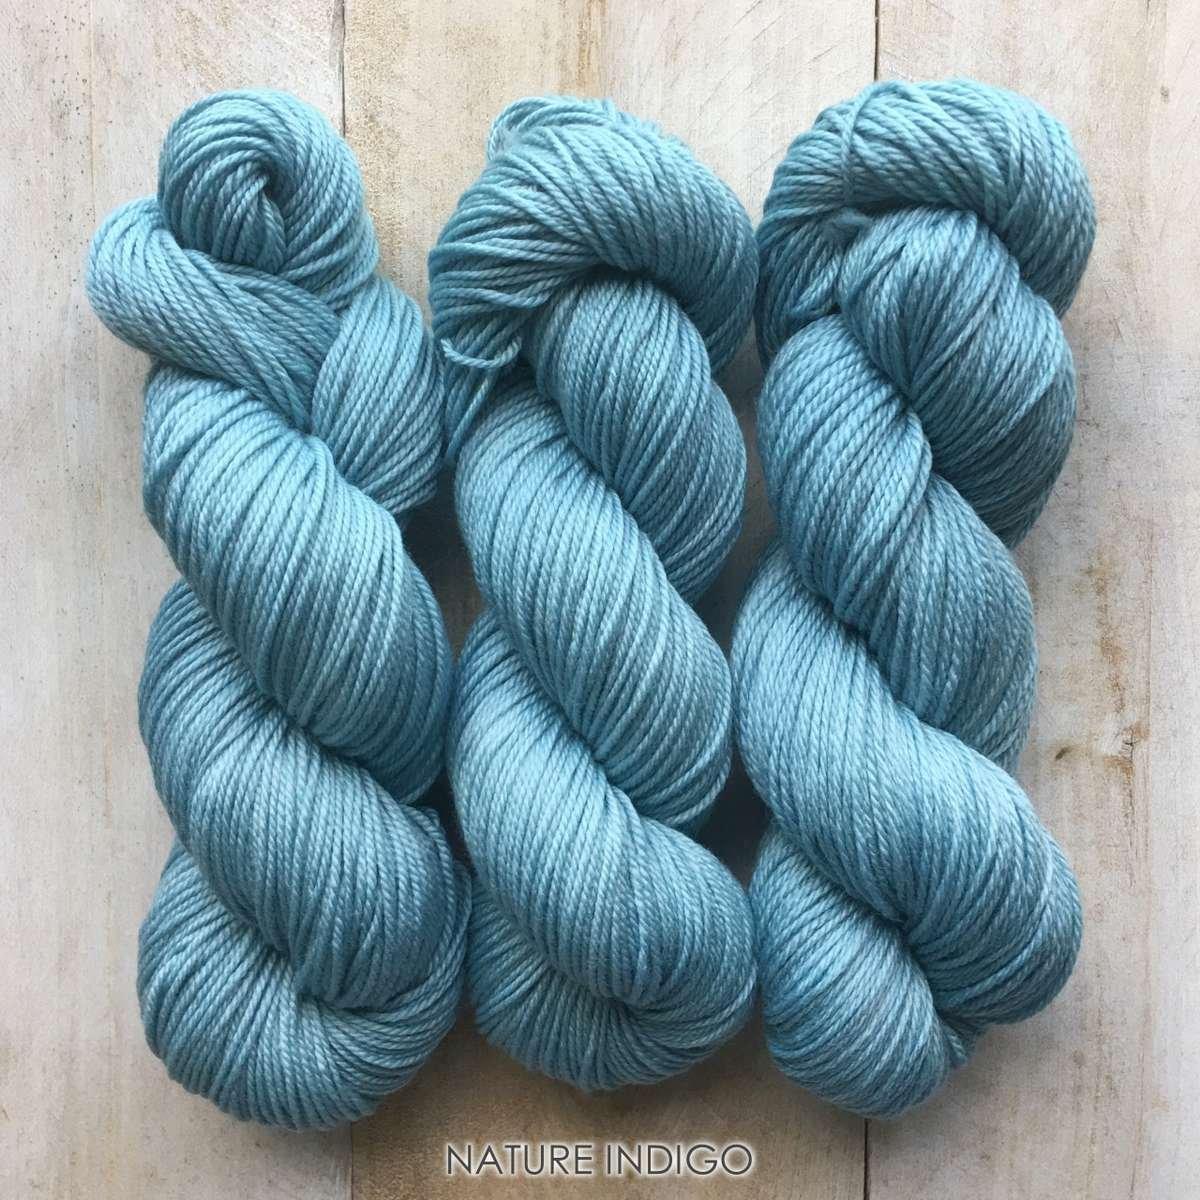 Hand-dyed yarn Louise Robert NATURE Indigo